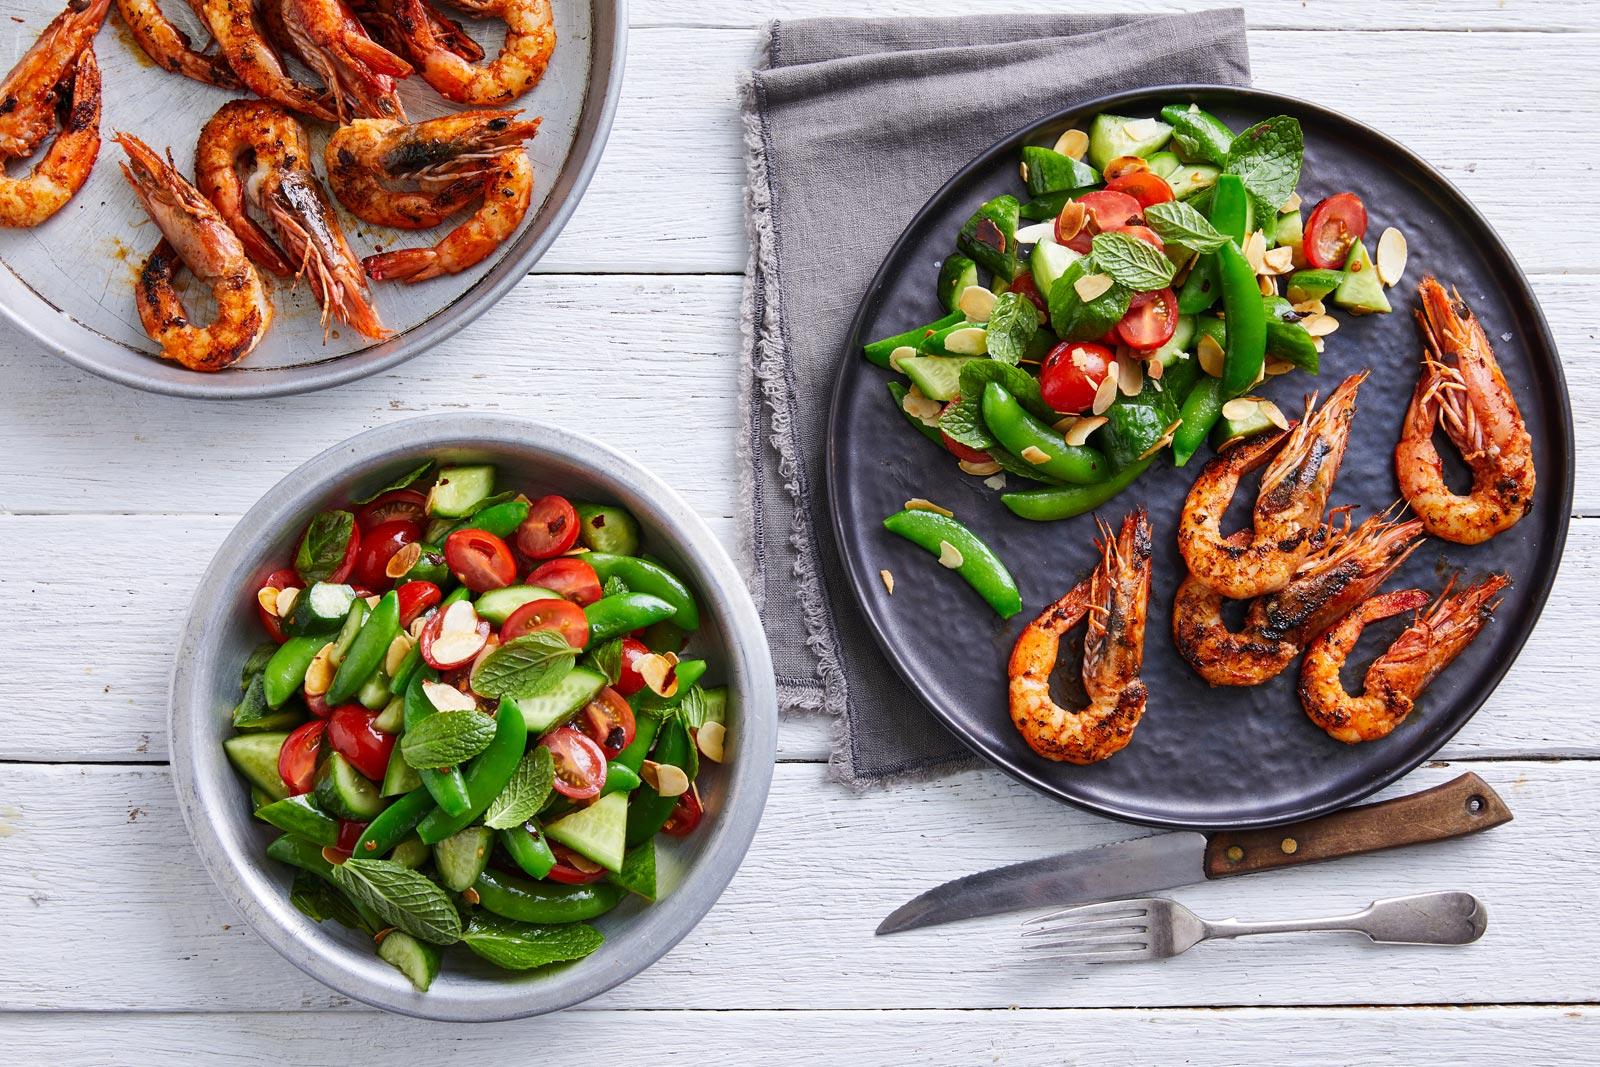 Recipe-Solanato-Qukes-Easy-Peasy-Peas-Marinated-Solonato-Qukes-&-Sugar-Snap-Pea-Salad-with-BBQ-Prawns